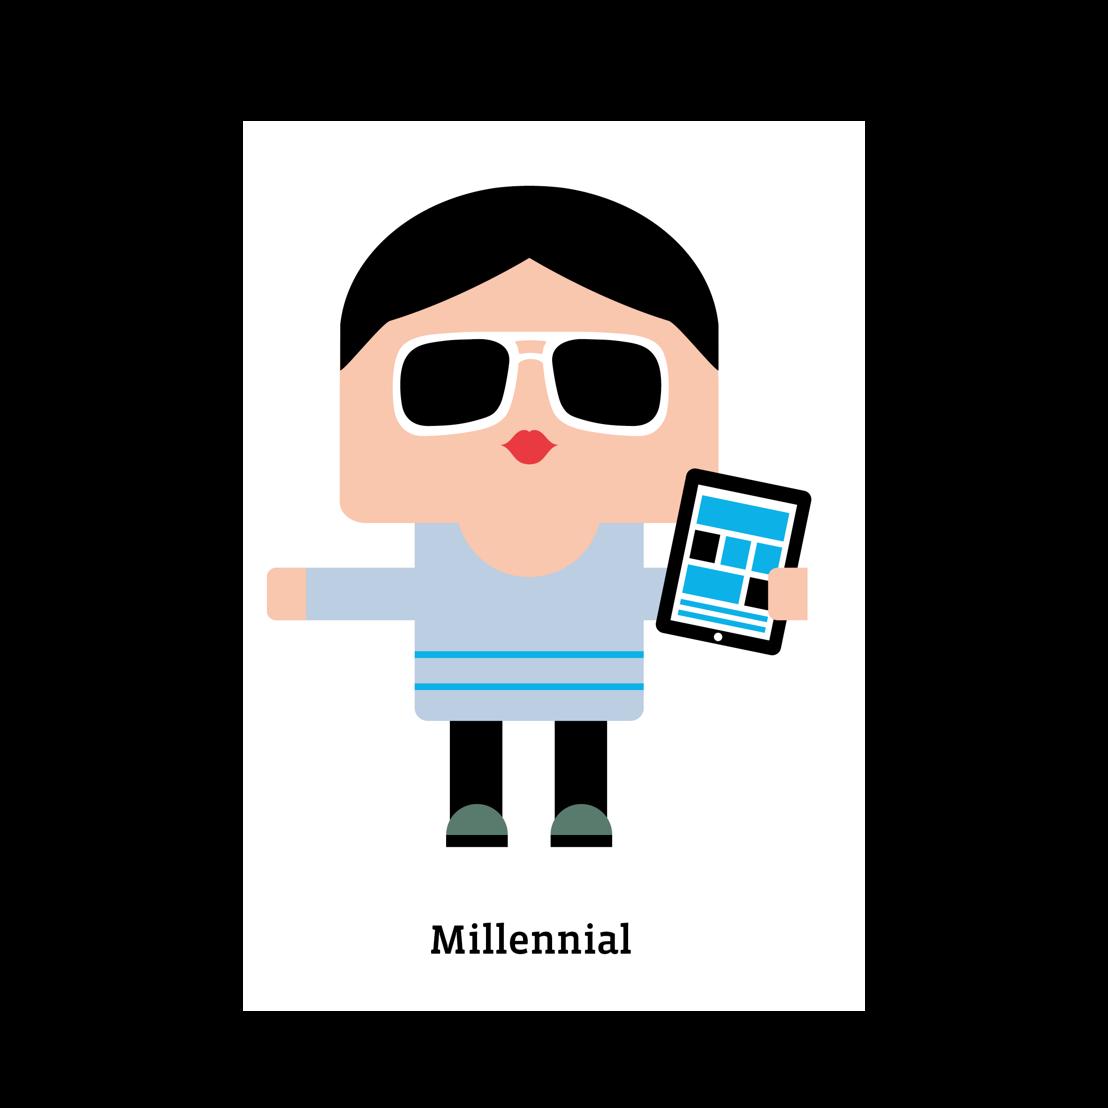 Who's IZI? - Millennial